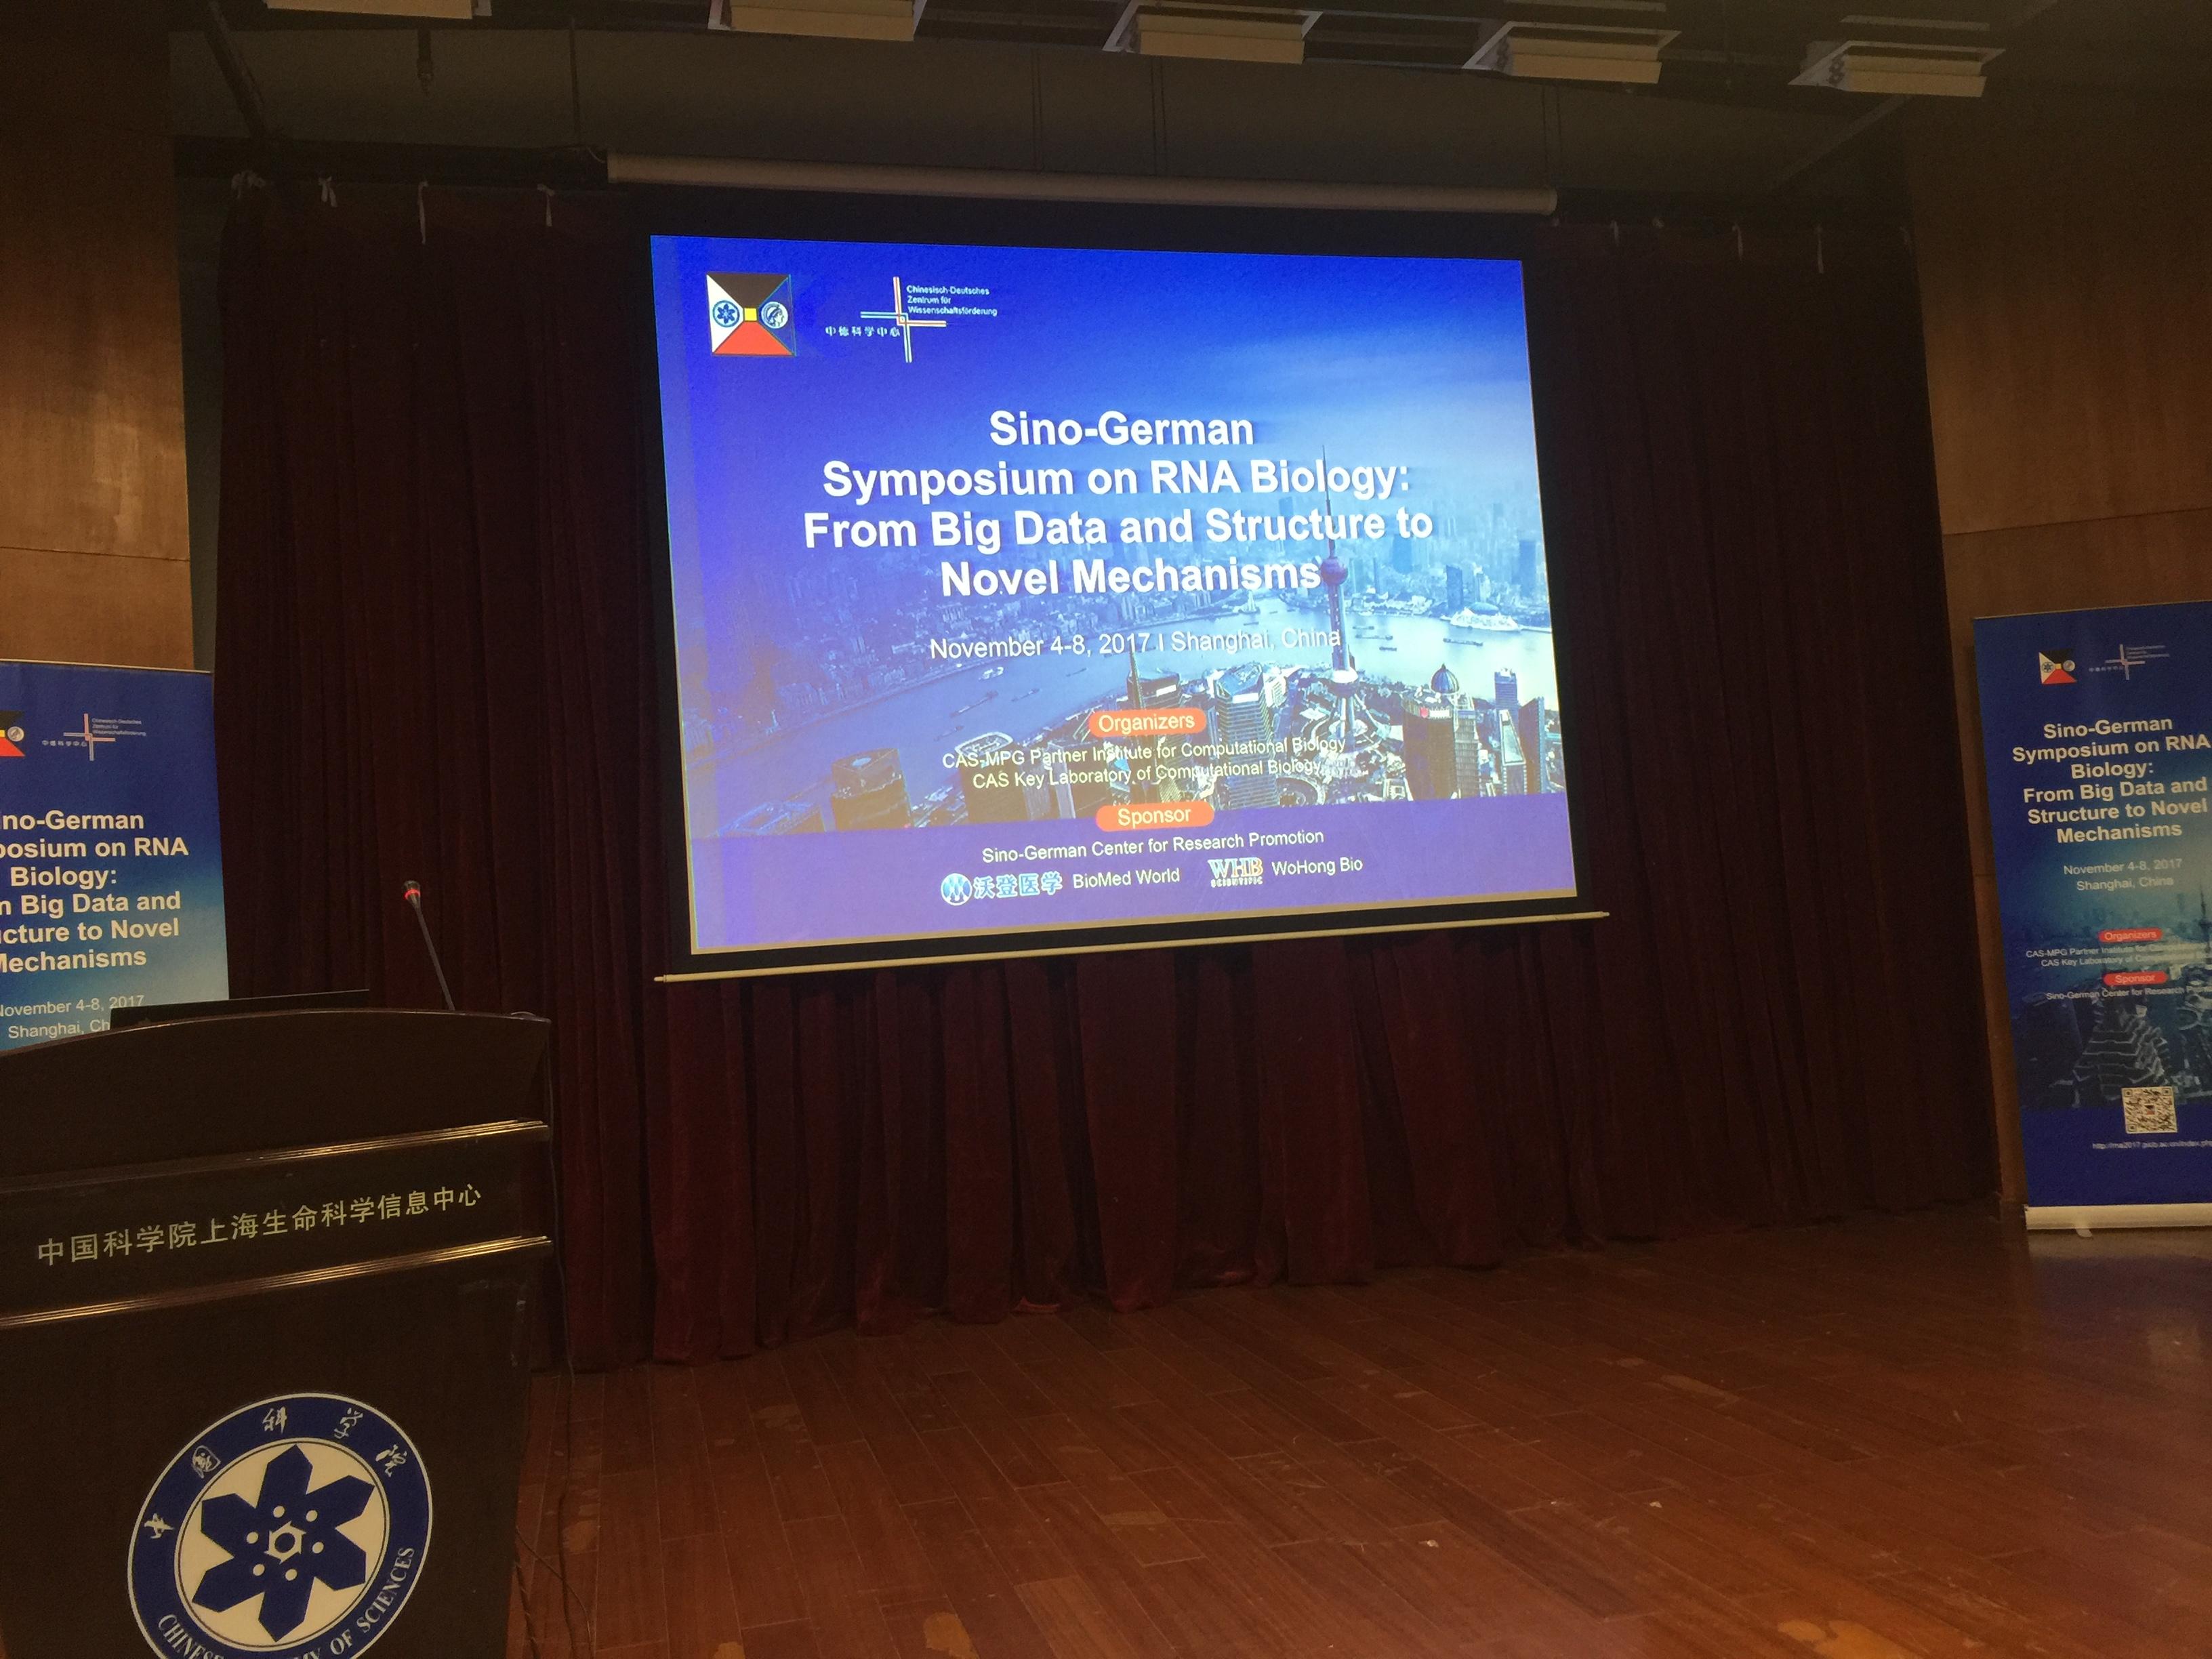 WHB永利集团娱乐官网地址生物携手中科院共同举办中德RNA研讨会